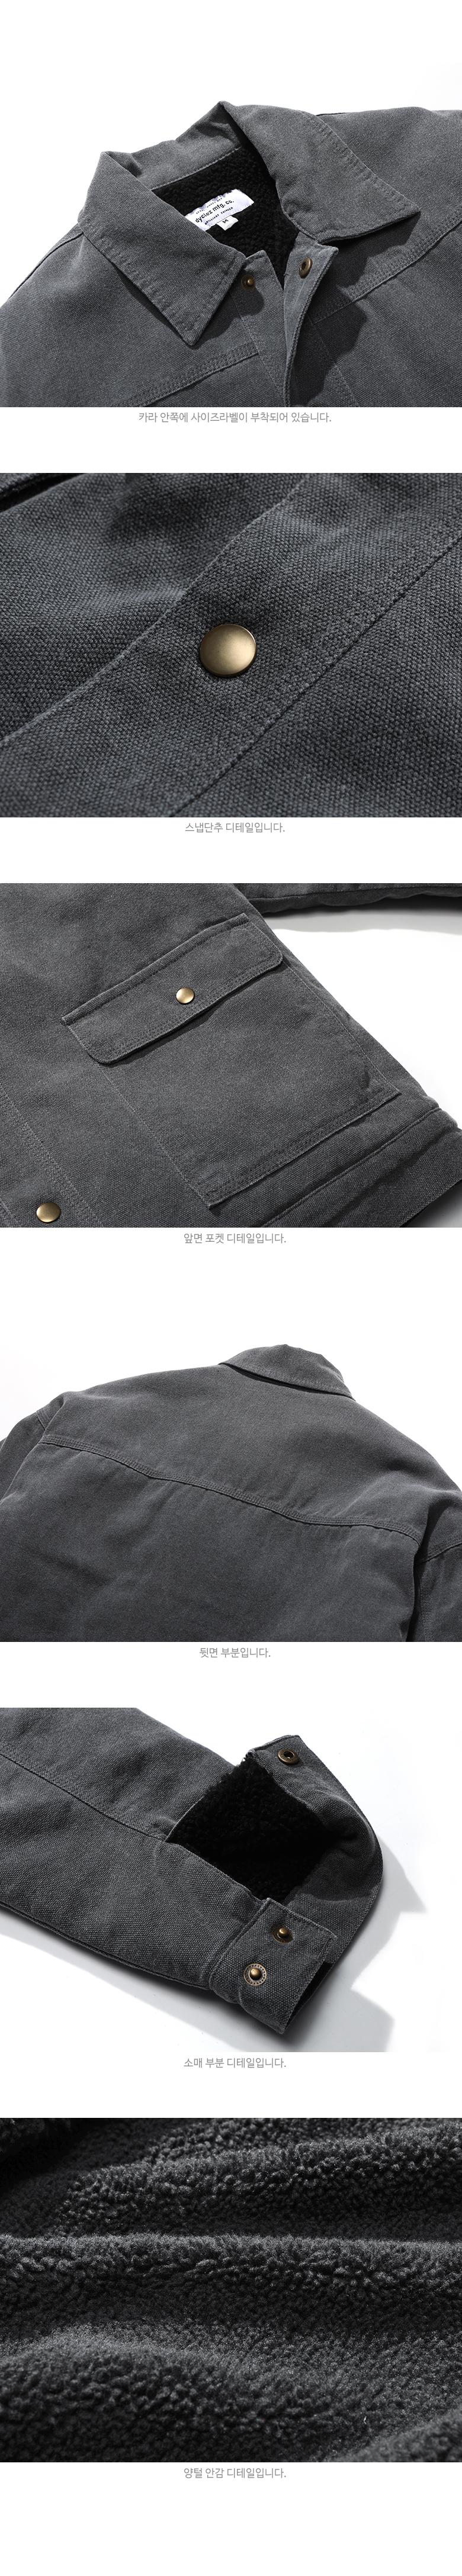 KHOT5094_detail_charcoal_02.jpg